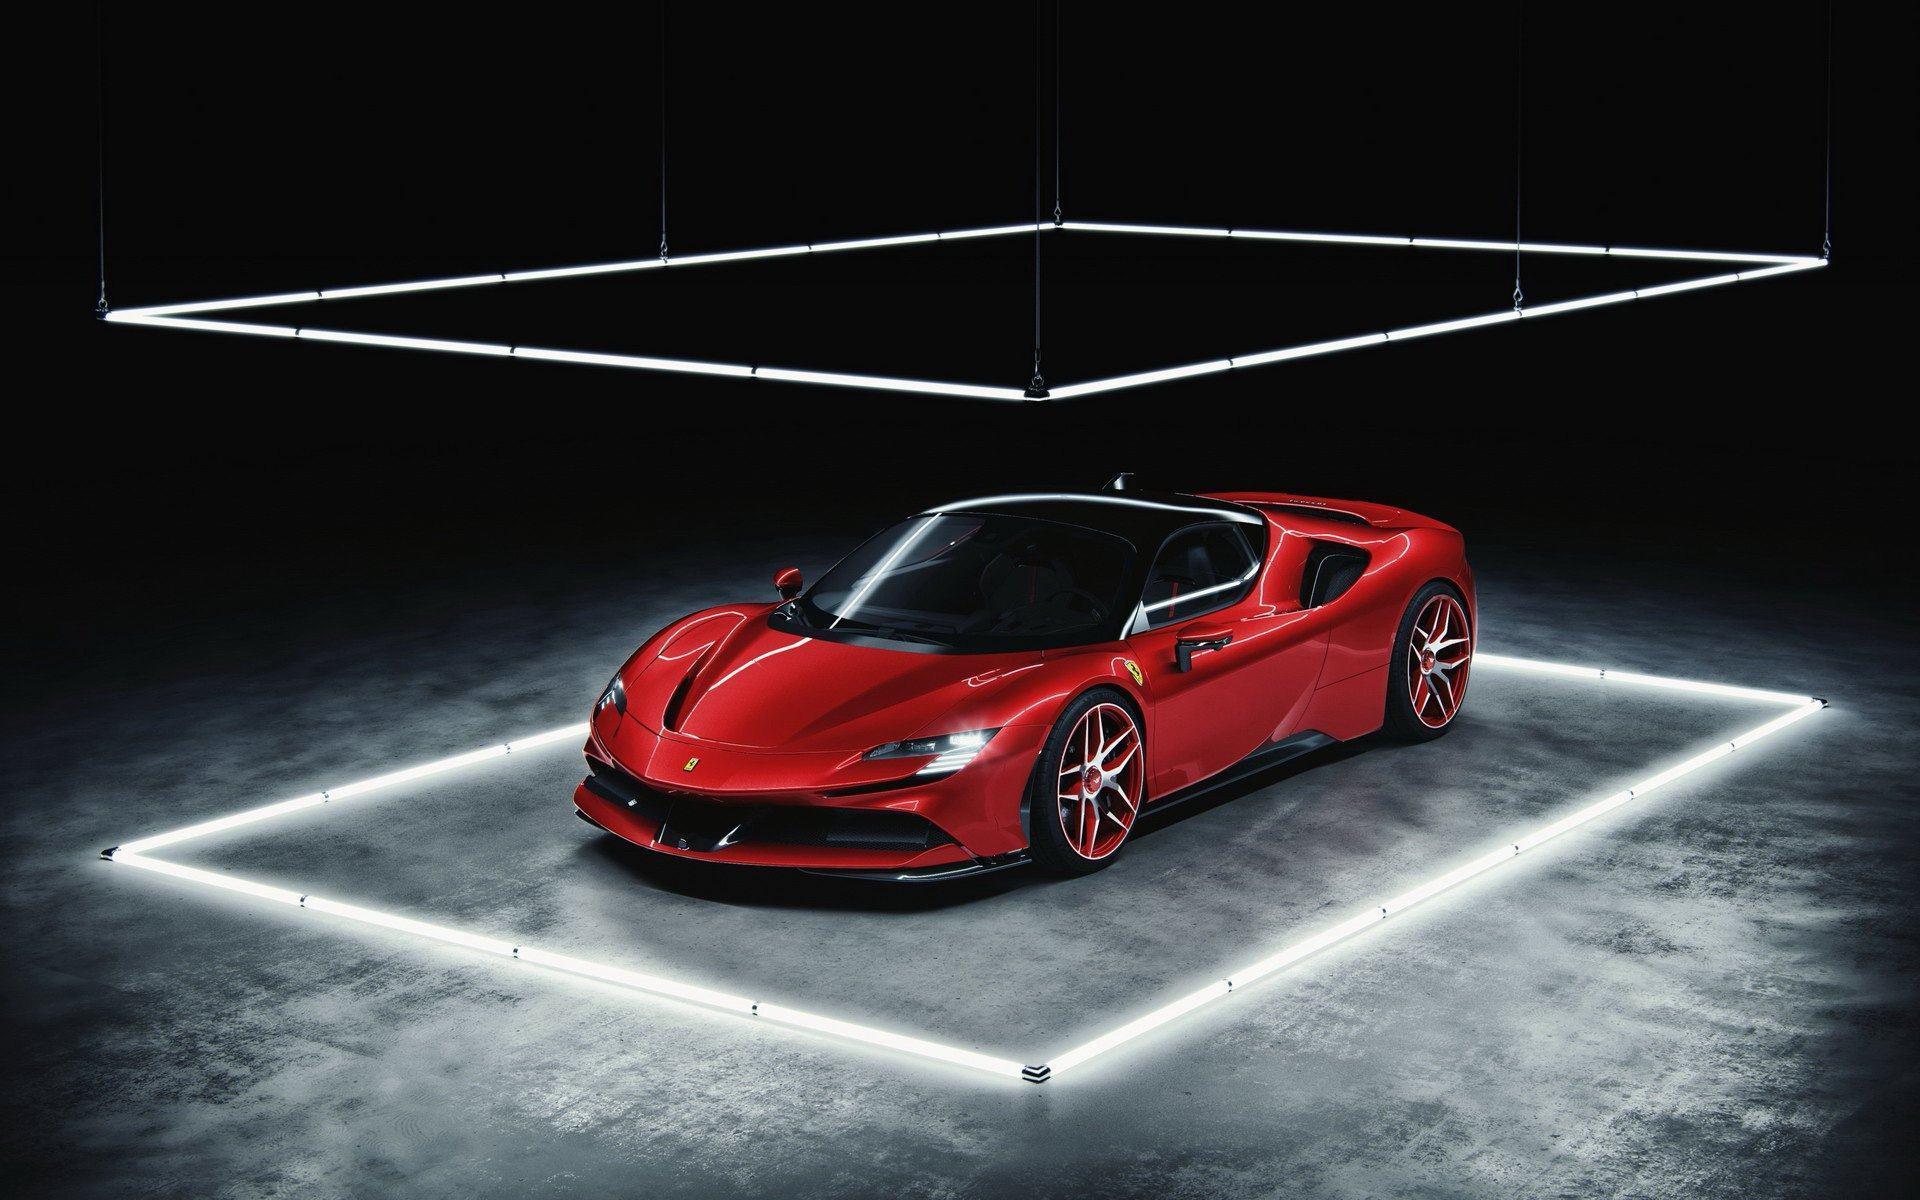 Ferrari_SF90_Stradale_by_Wheelsandmore_0011